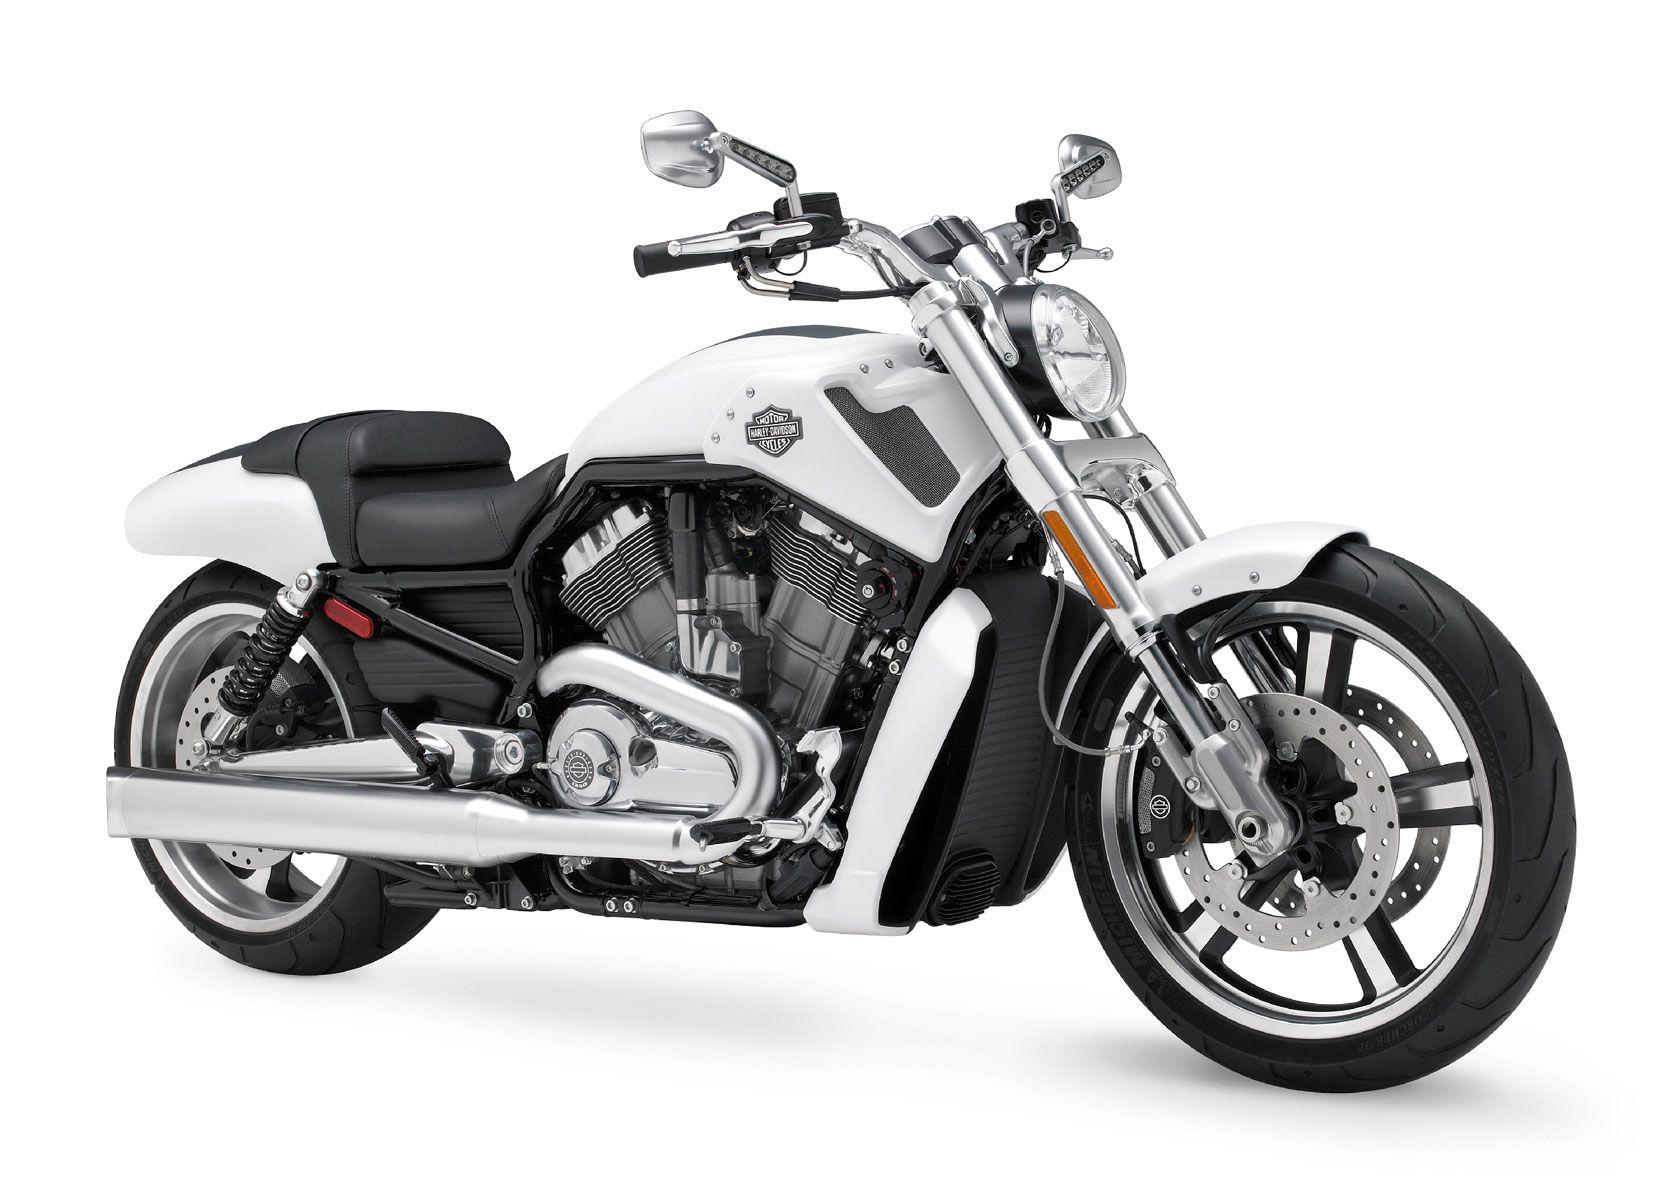 Harley Davidson V Rod Muscle Wallpapers 1680x1203